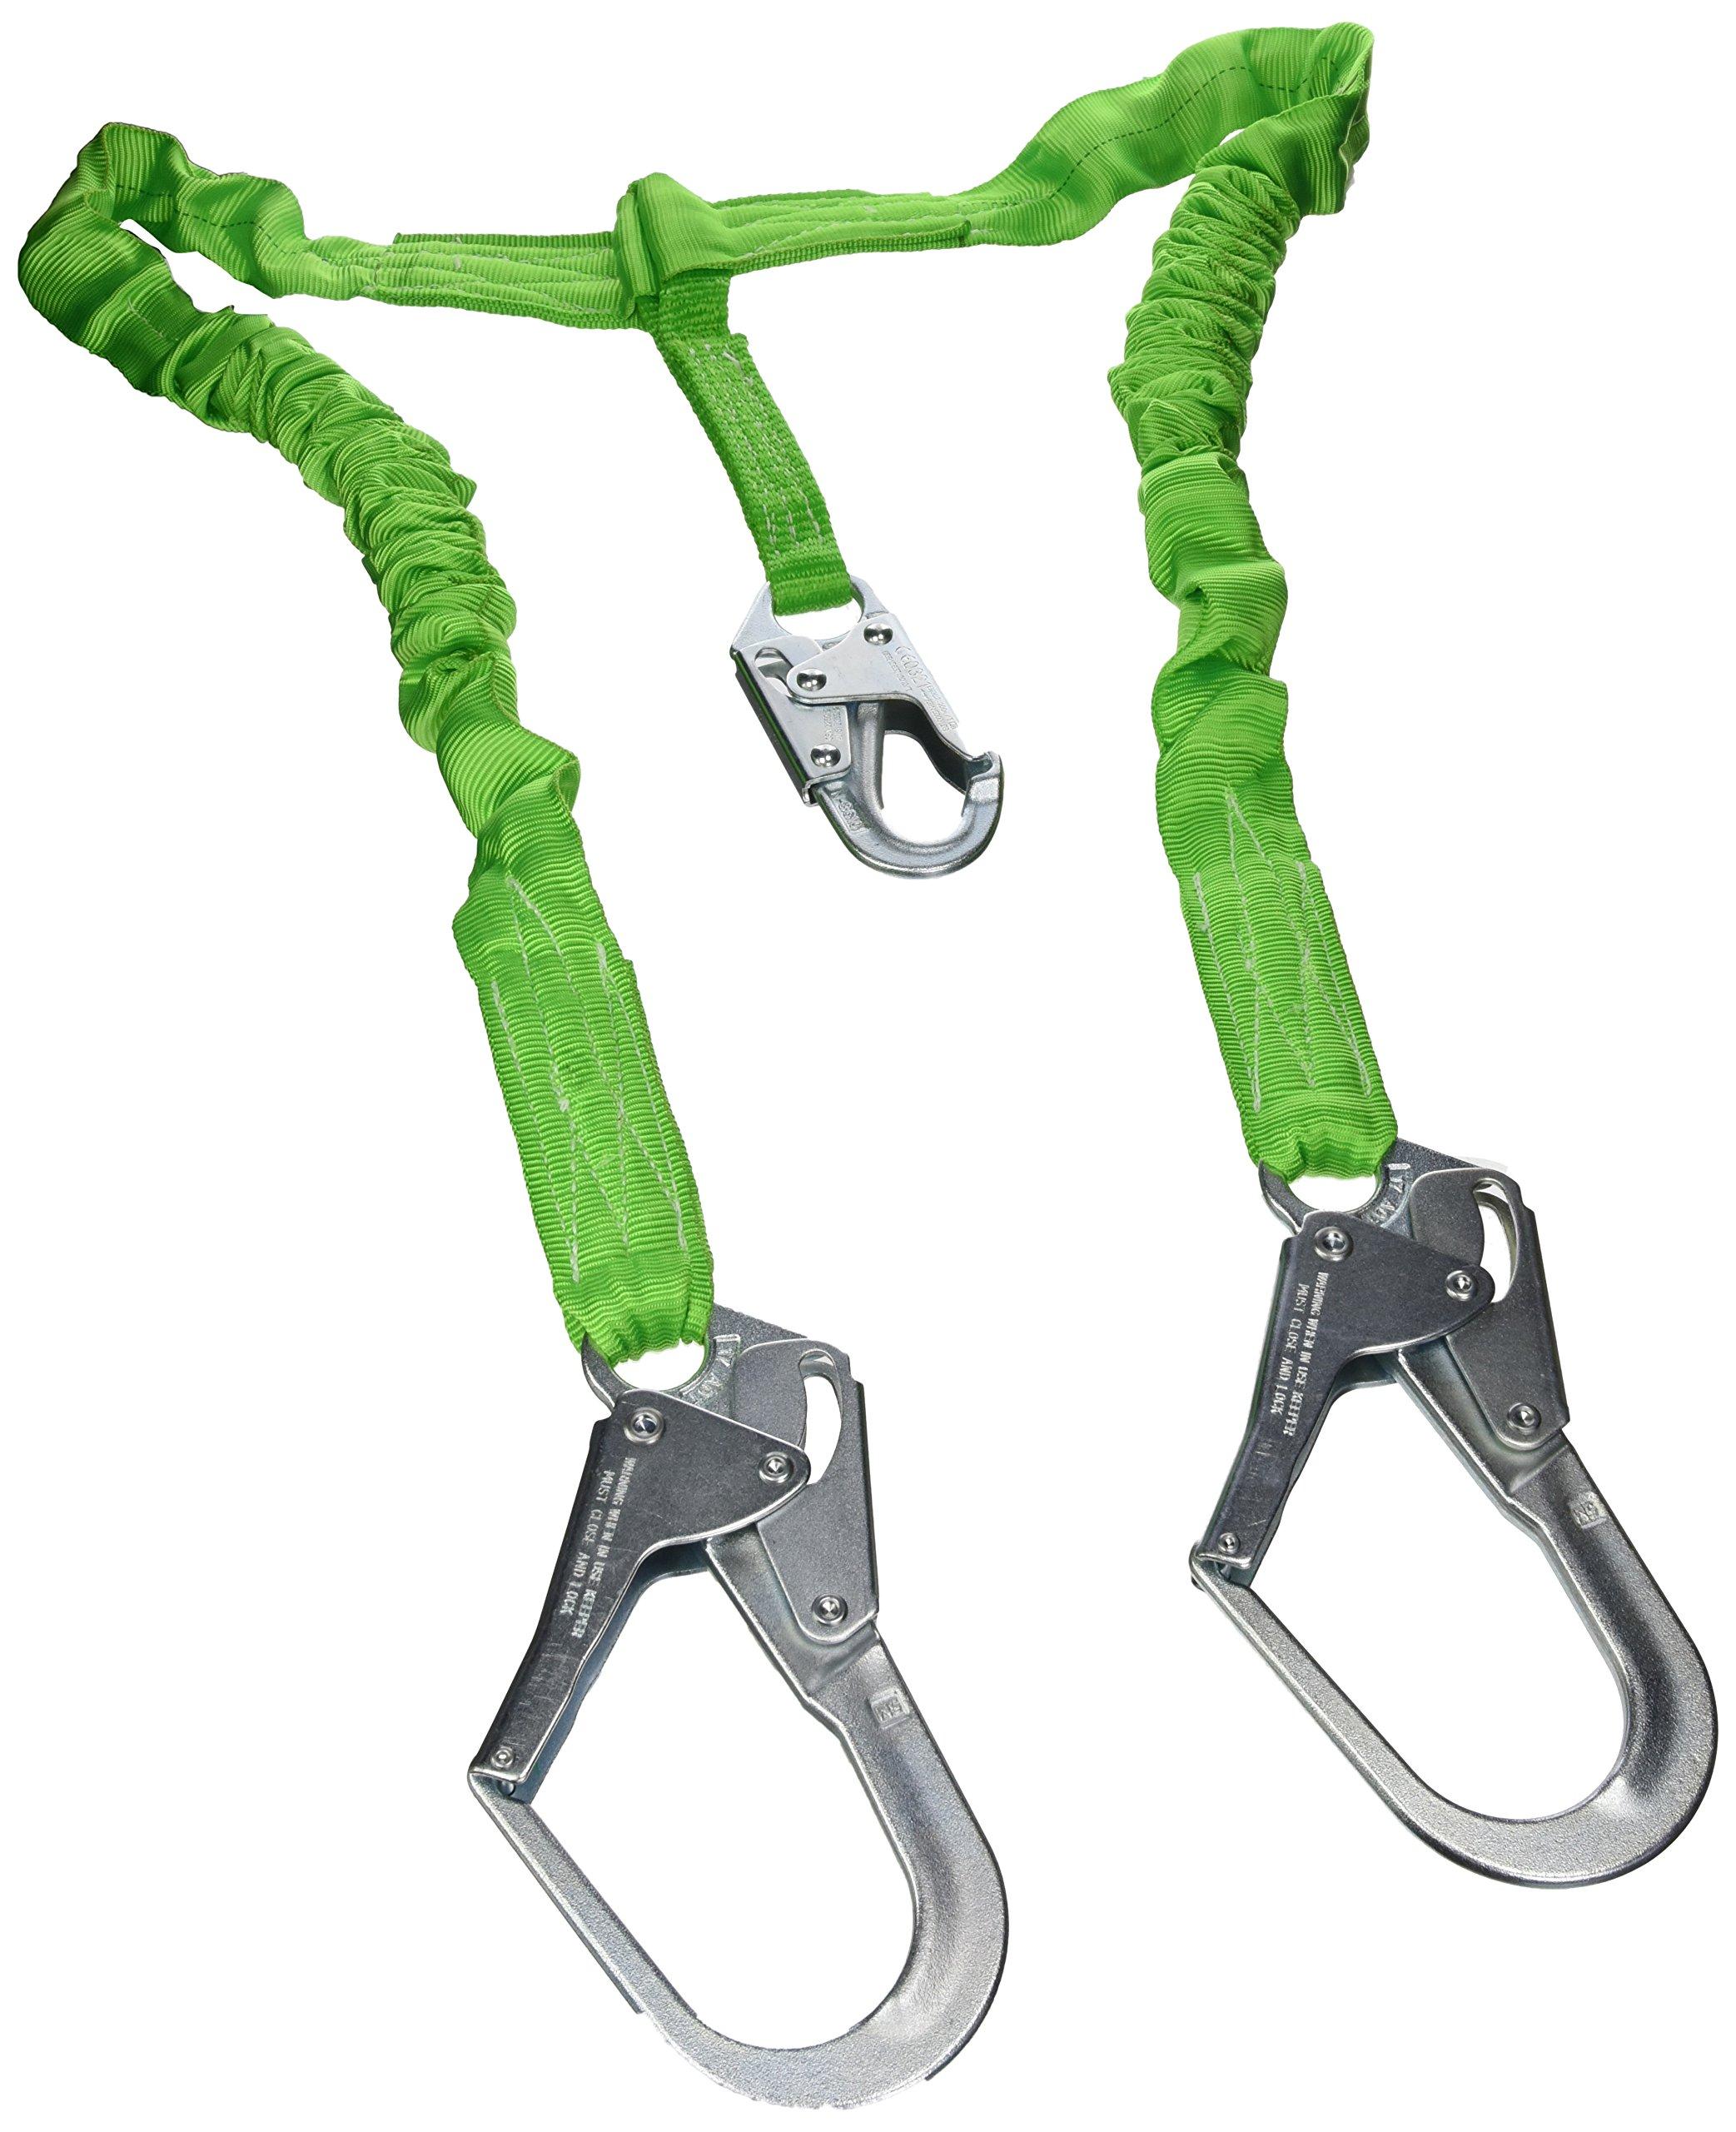 Miller by Honeywell 231M/5FTGN 5-Feet Manyard II Shock-Absorbing Stretchable Web Lanyard with 2-1/2-Inch Locking Rebar Hook, Green